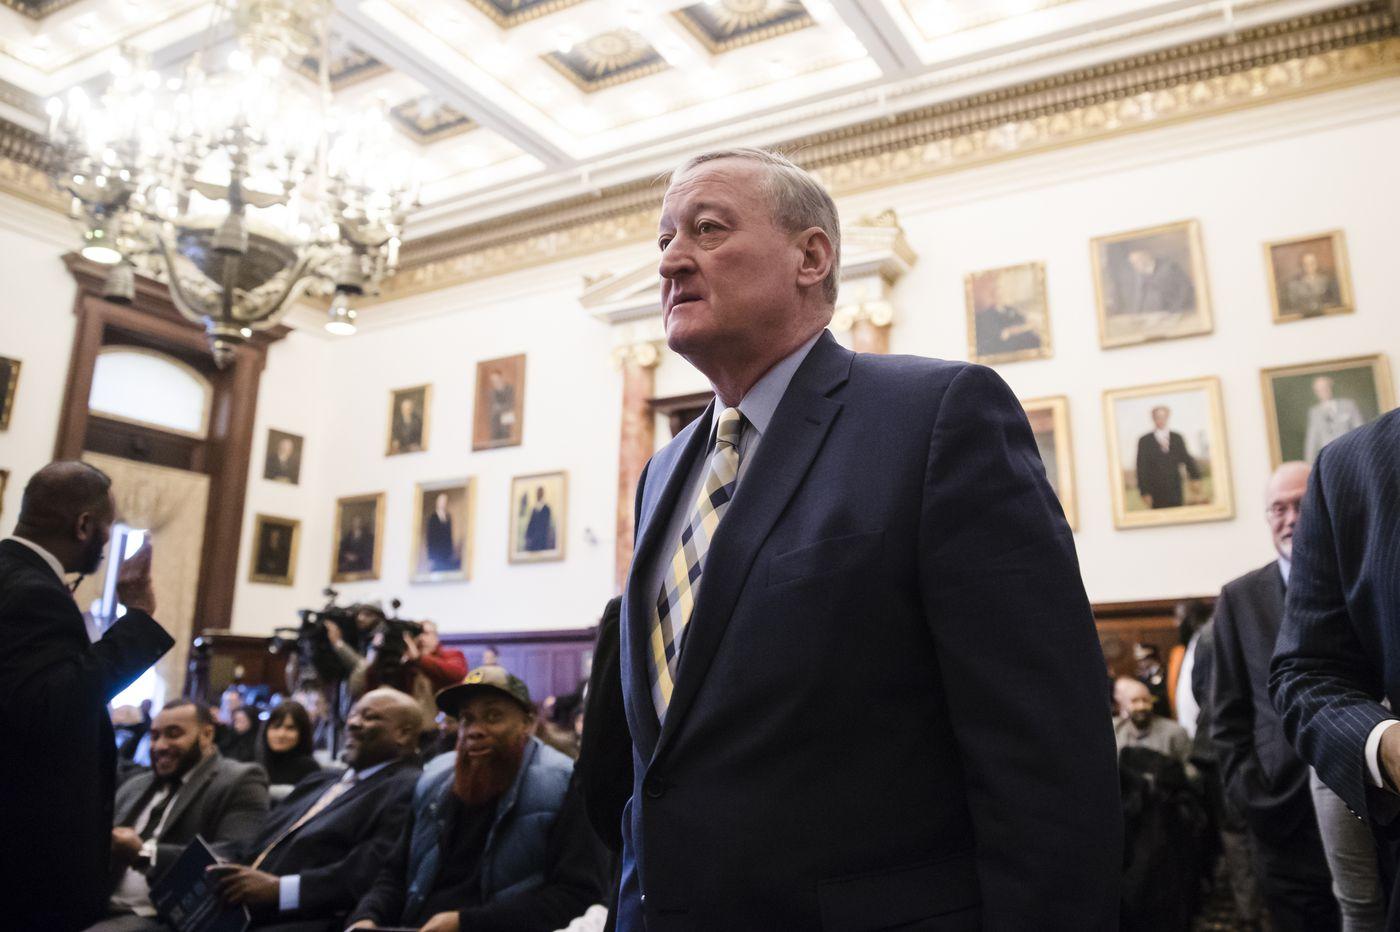 After bloody 2018, Philadelphia unveils gun violence plan